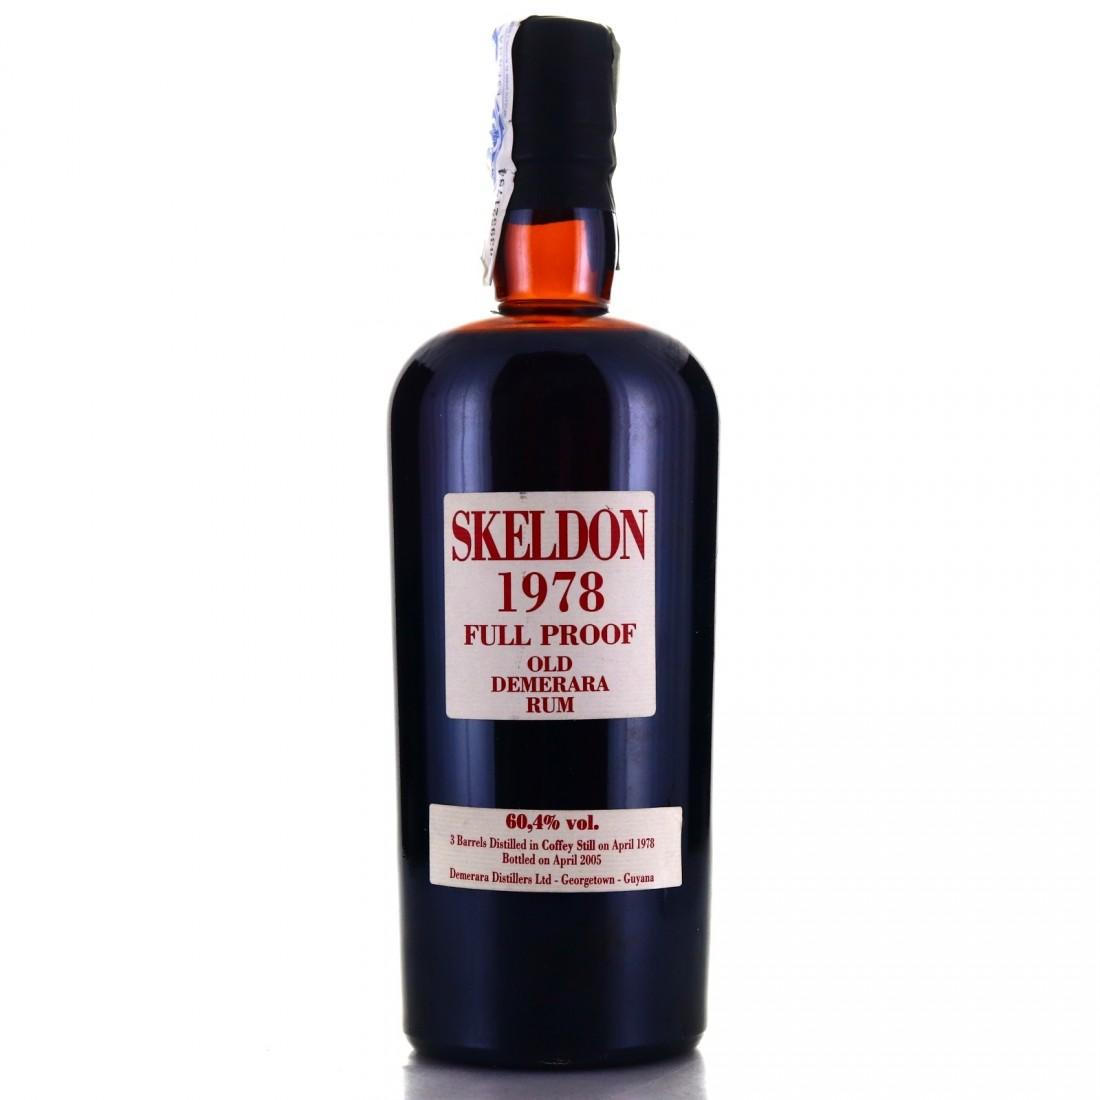 Skeldon SWR 1978 Velier 27 Year Old